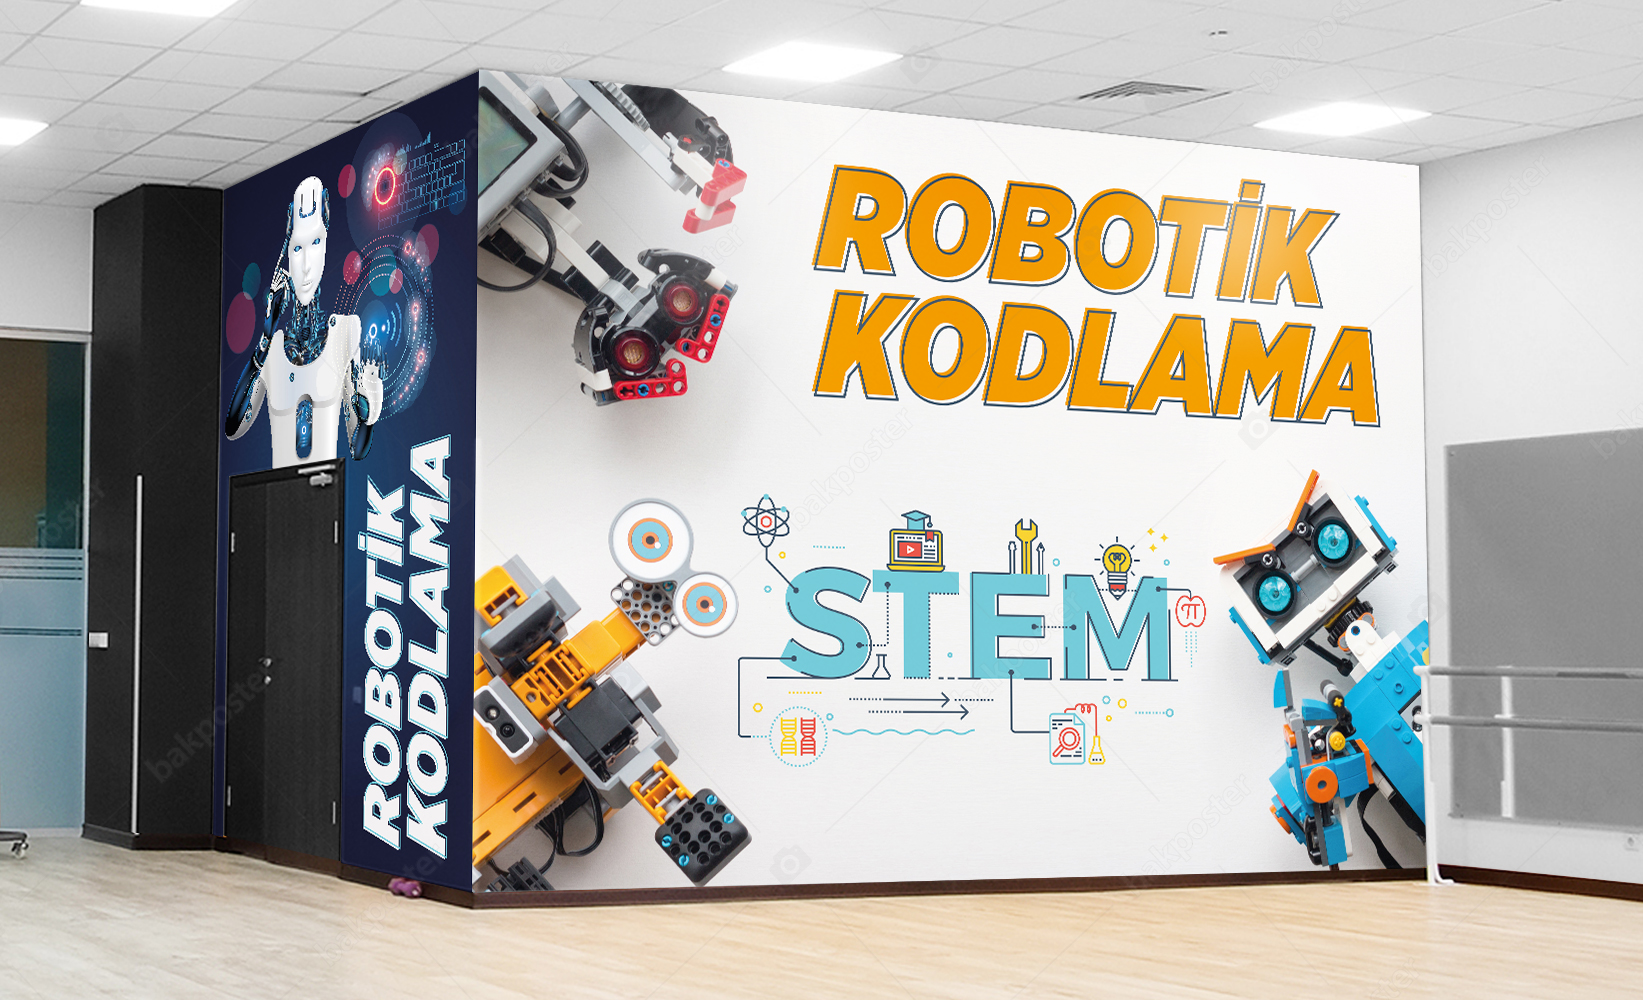 Robotik Kodlama Duvar Kağıdı